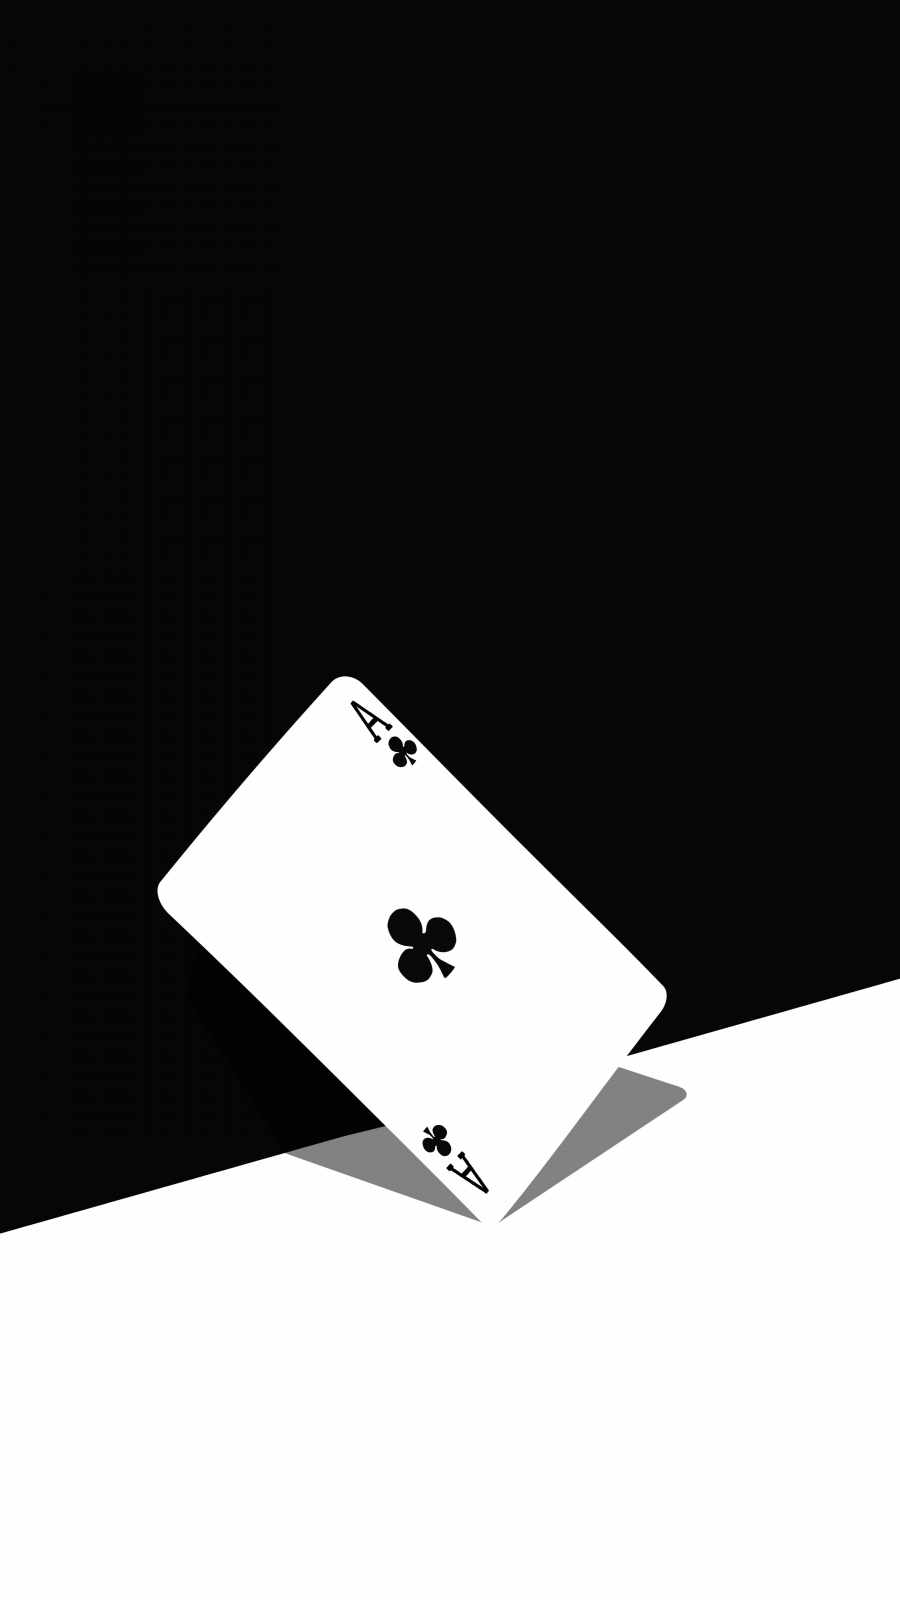 Ace Card Minimal